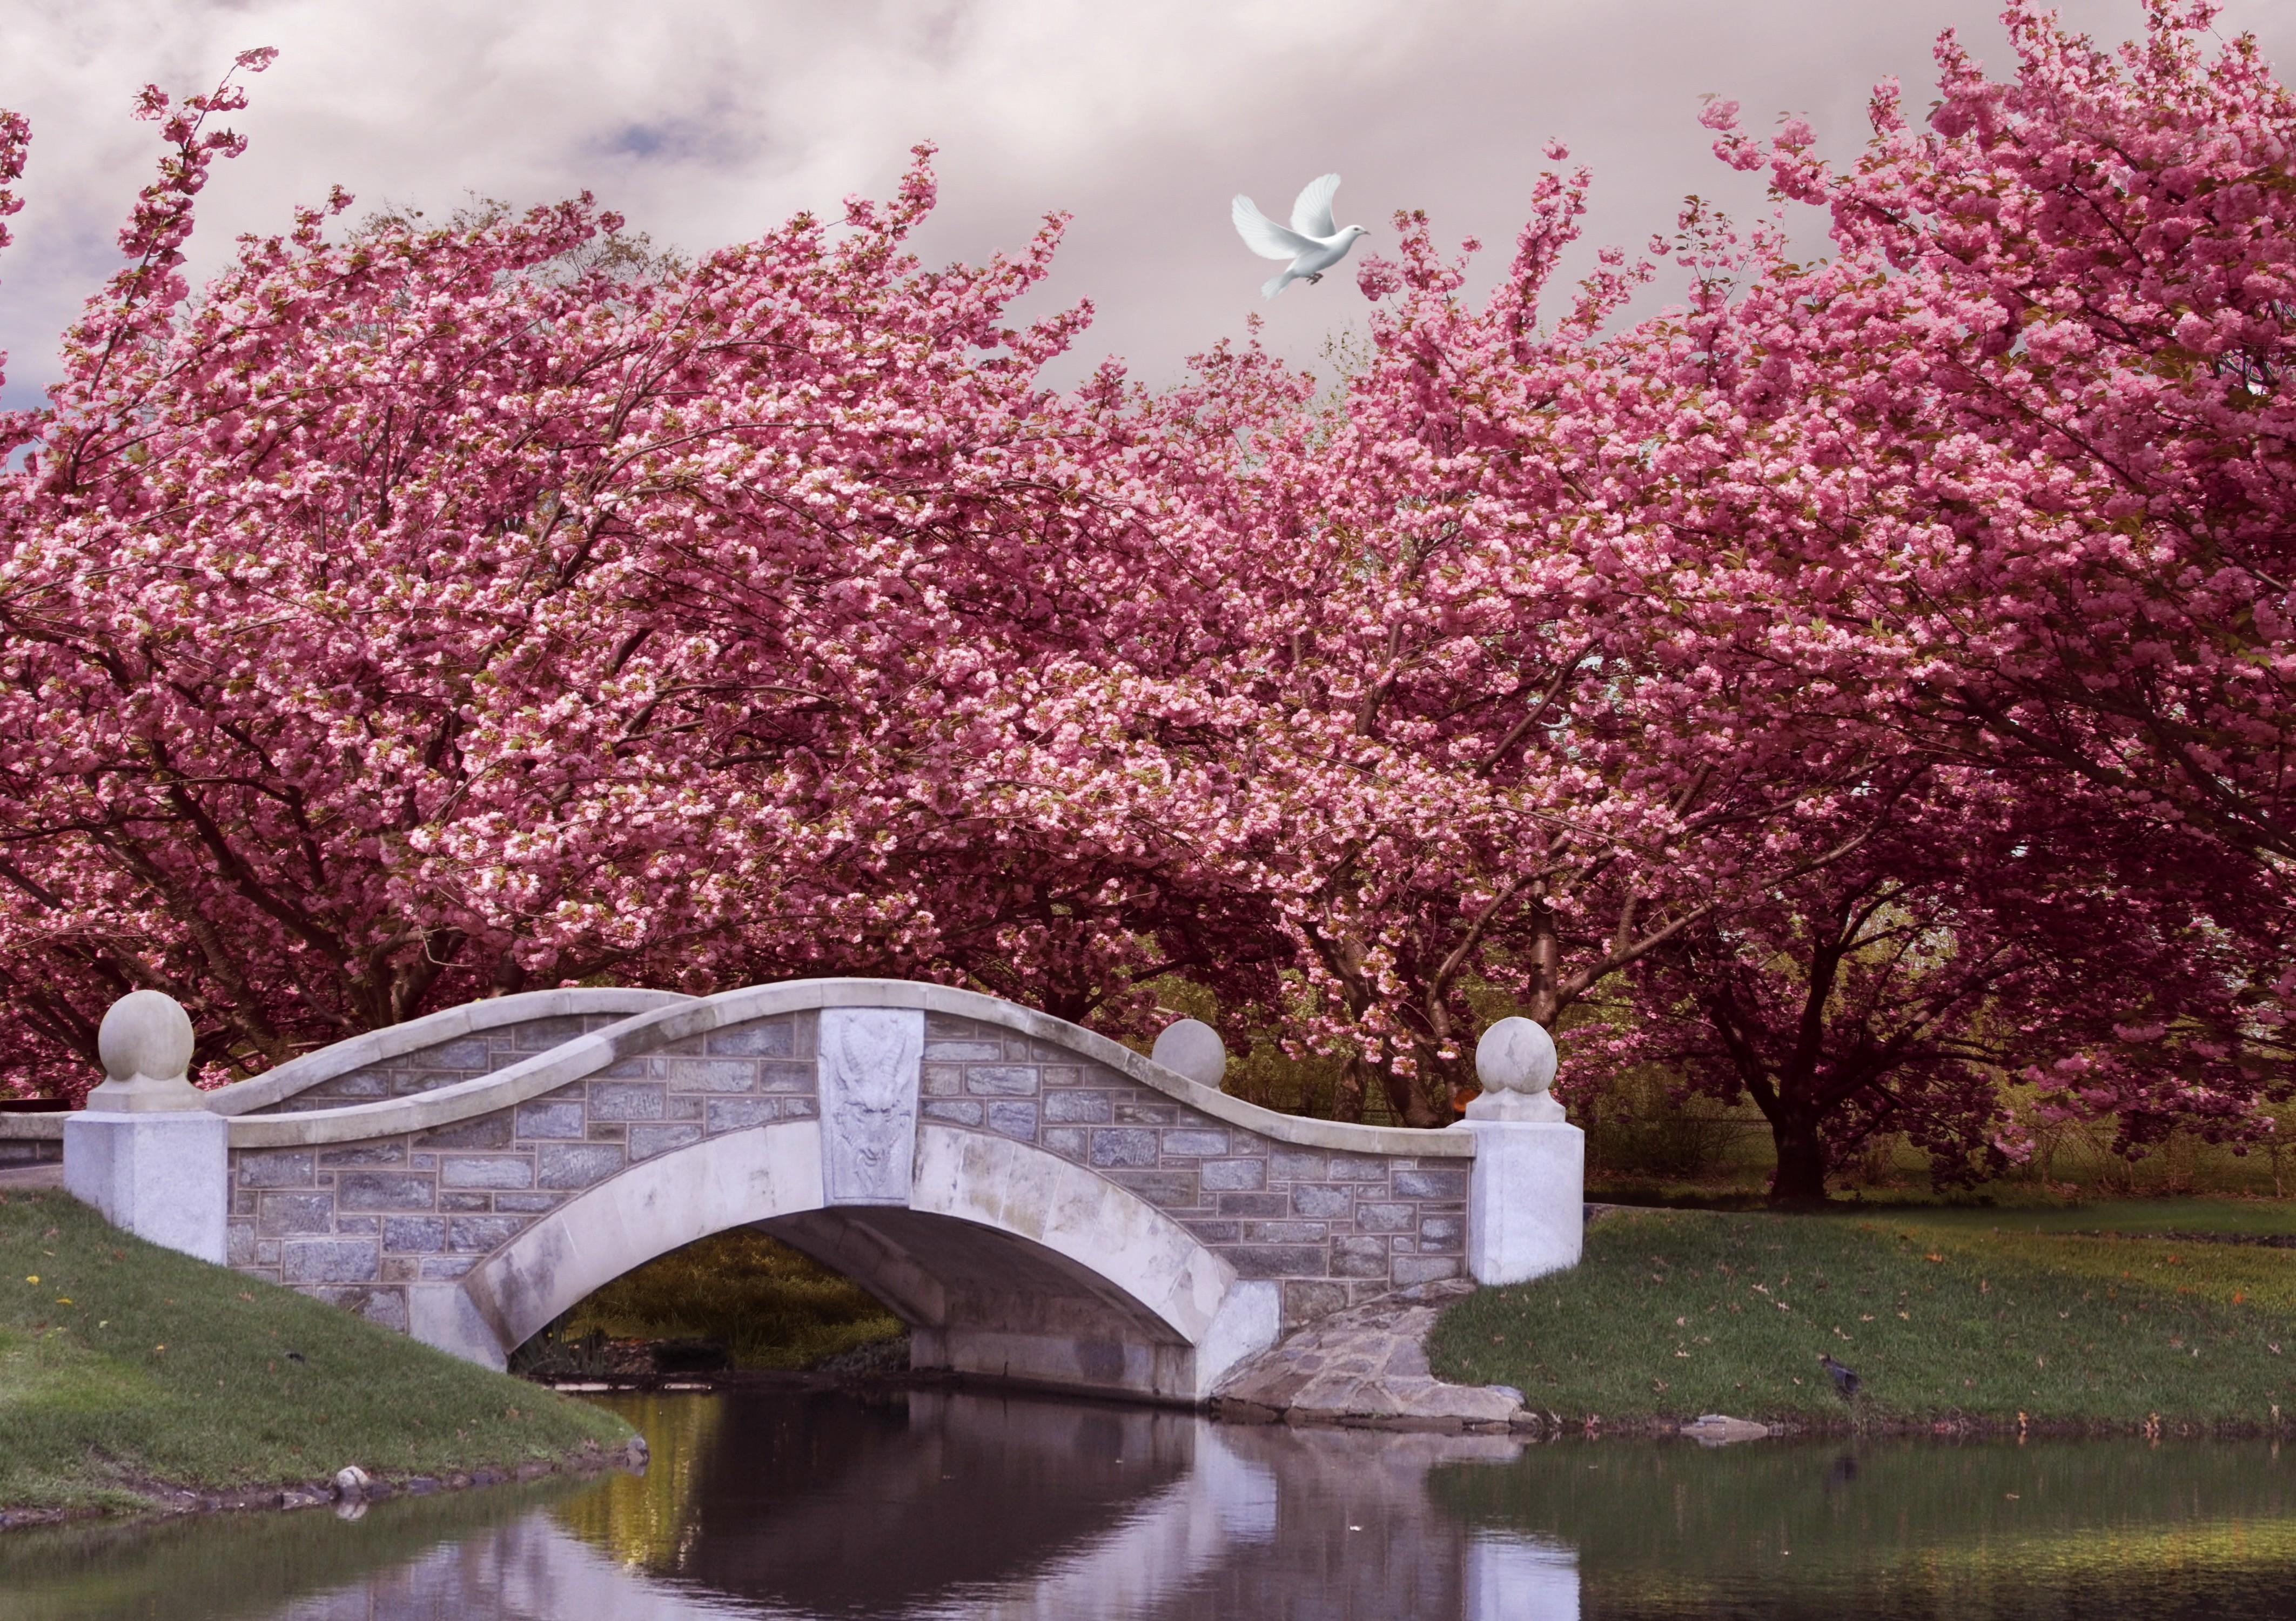 Iphone X Liquid Wallpaper Android Japan Wallpaper Nature Meadows Japan Blossom Cherry